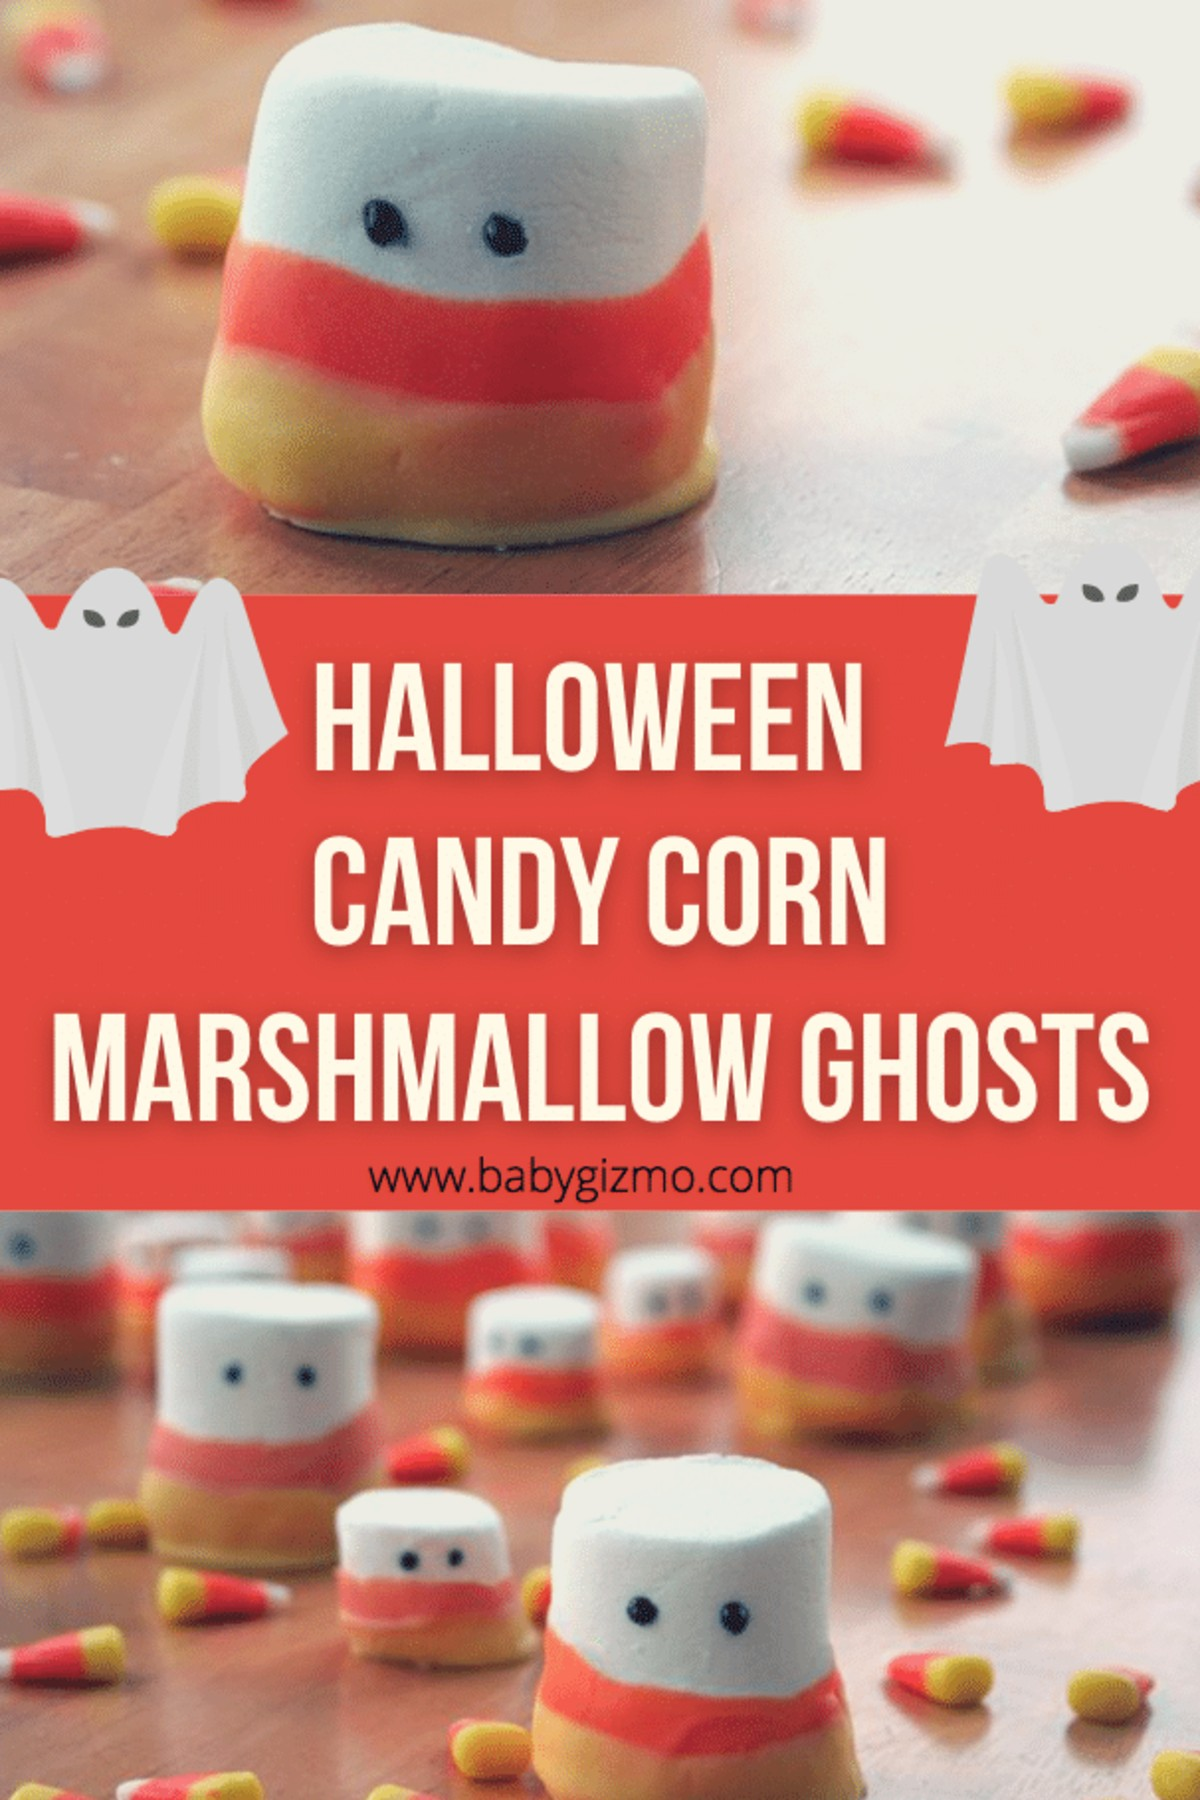 Halloween Candy Corn Marshmallow Ghosts